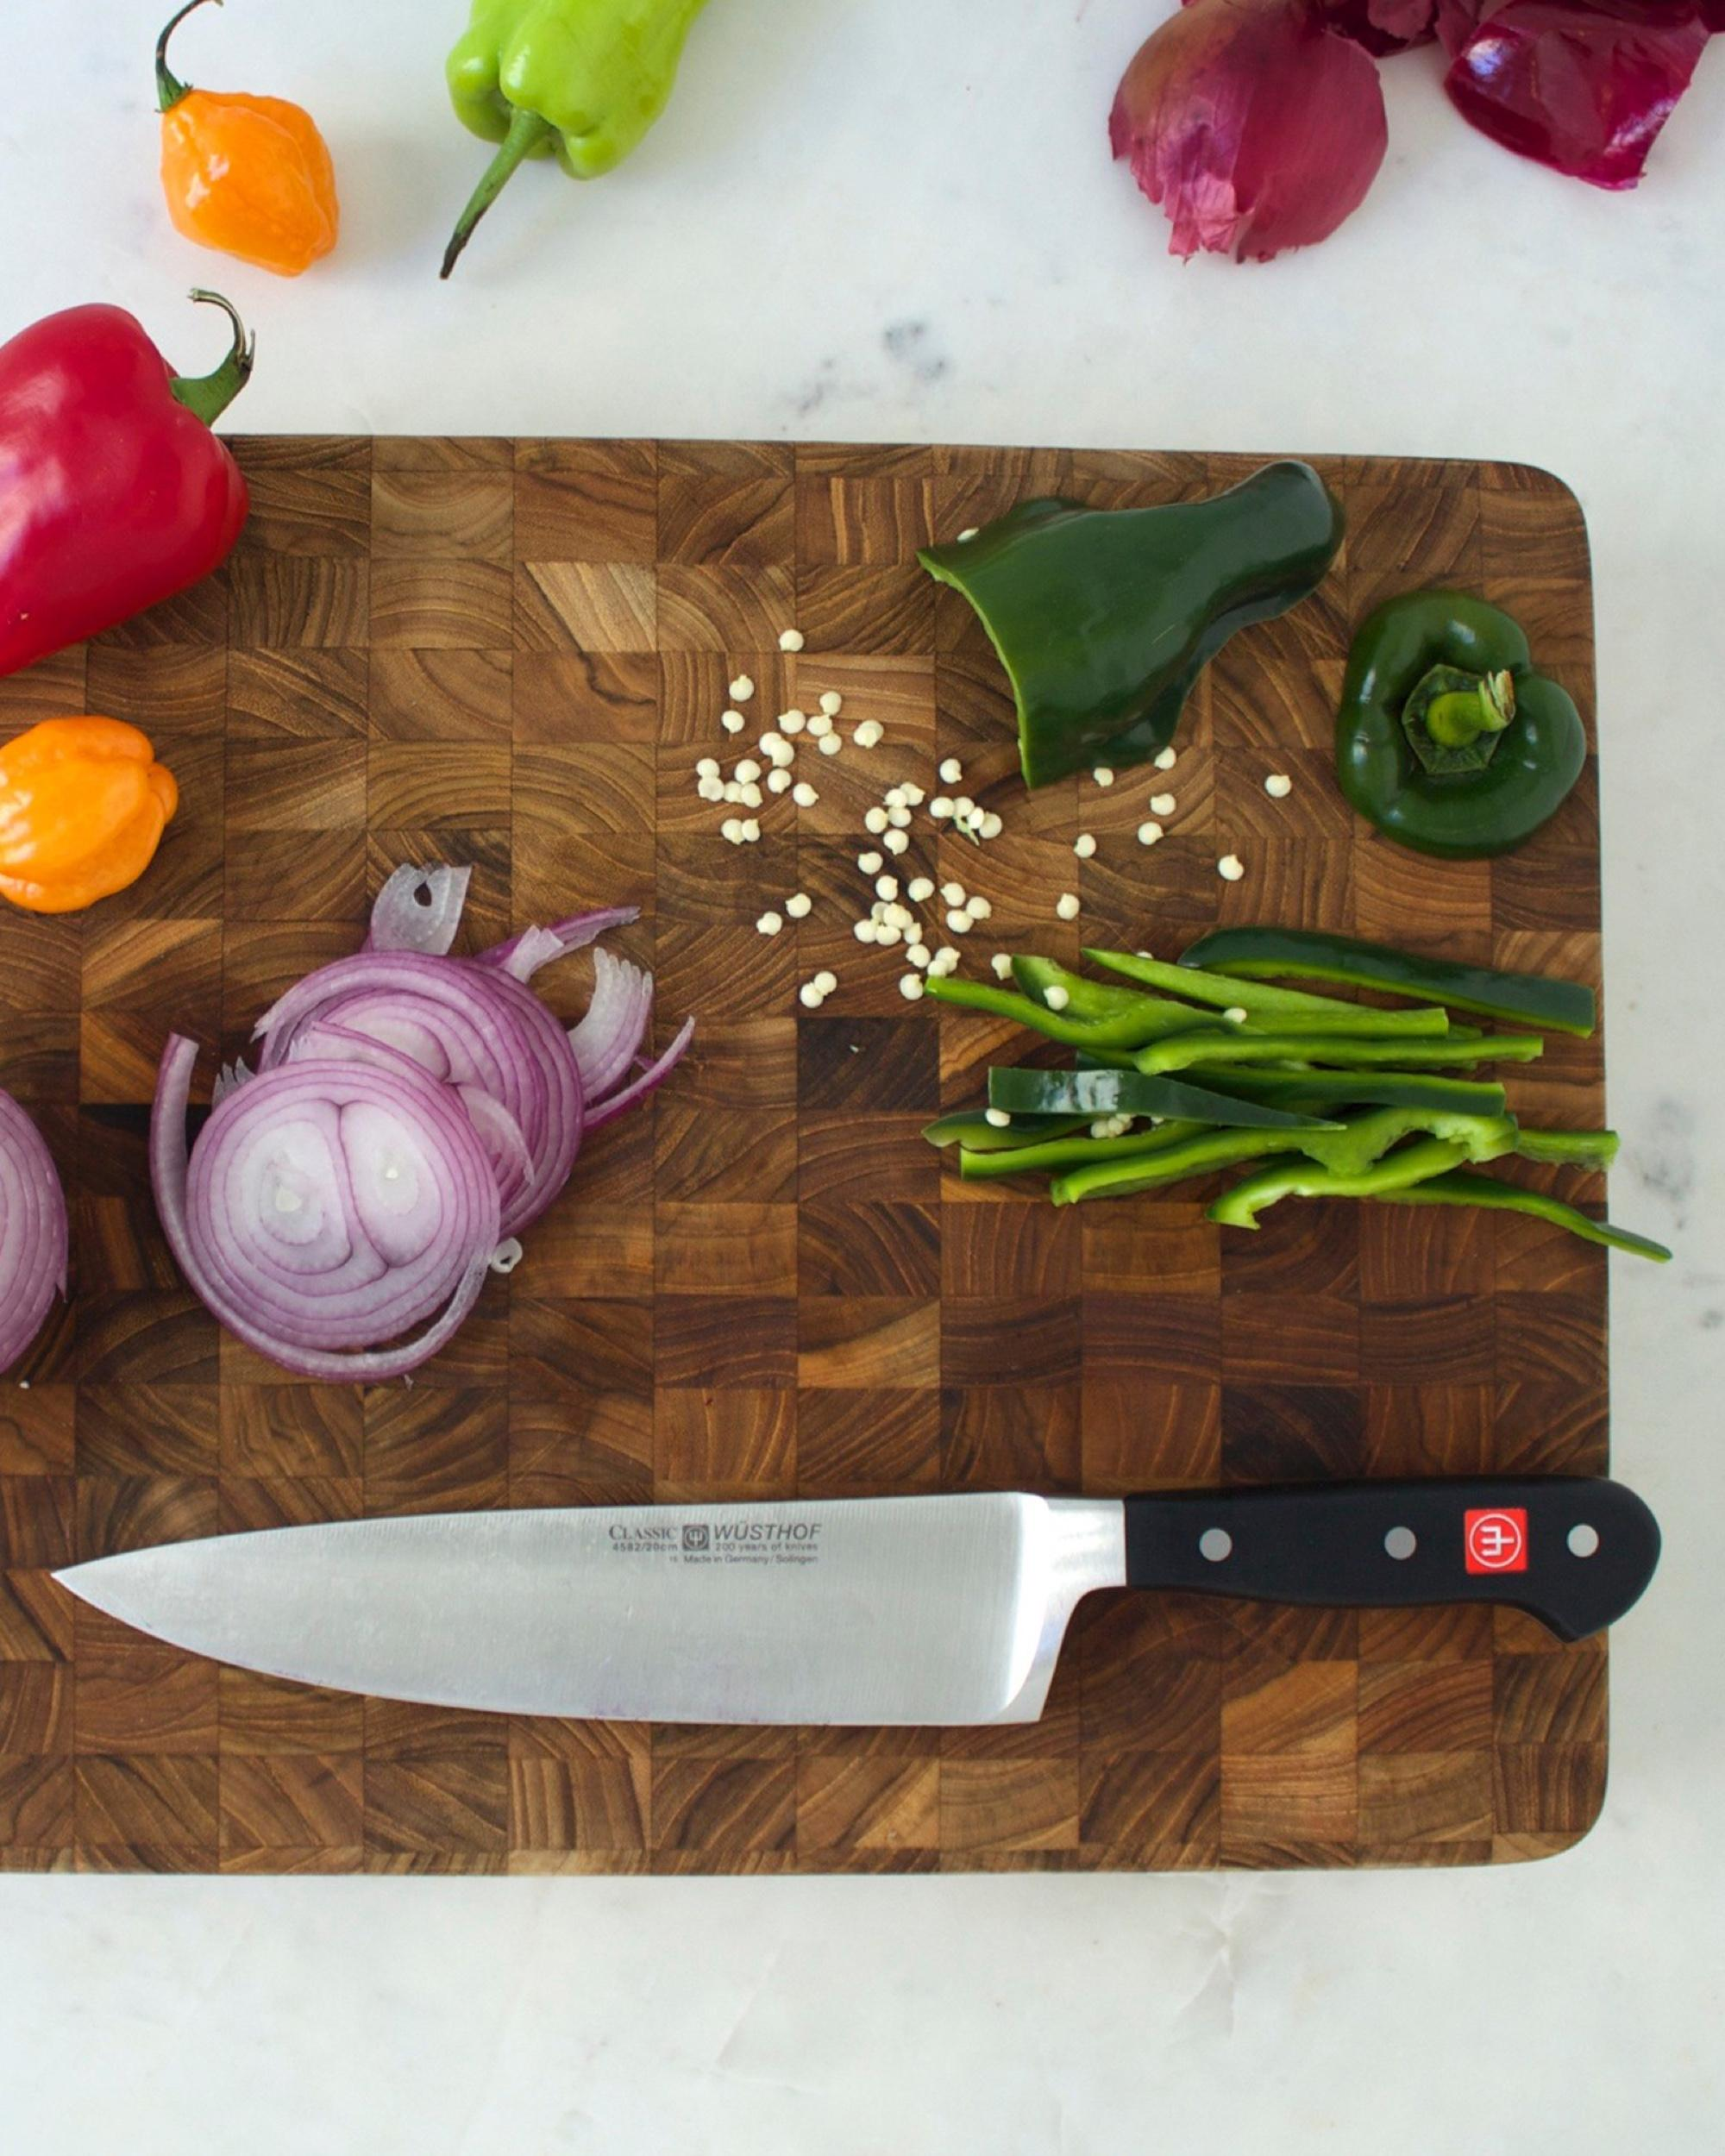 wusthof-classic-cooks-knife-0815